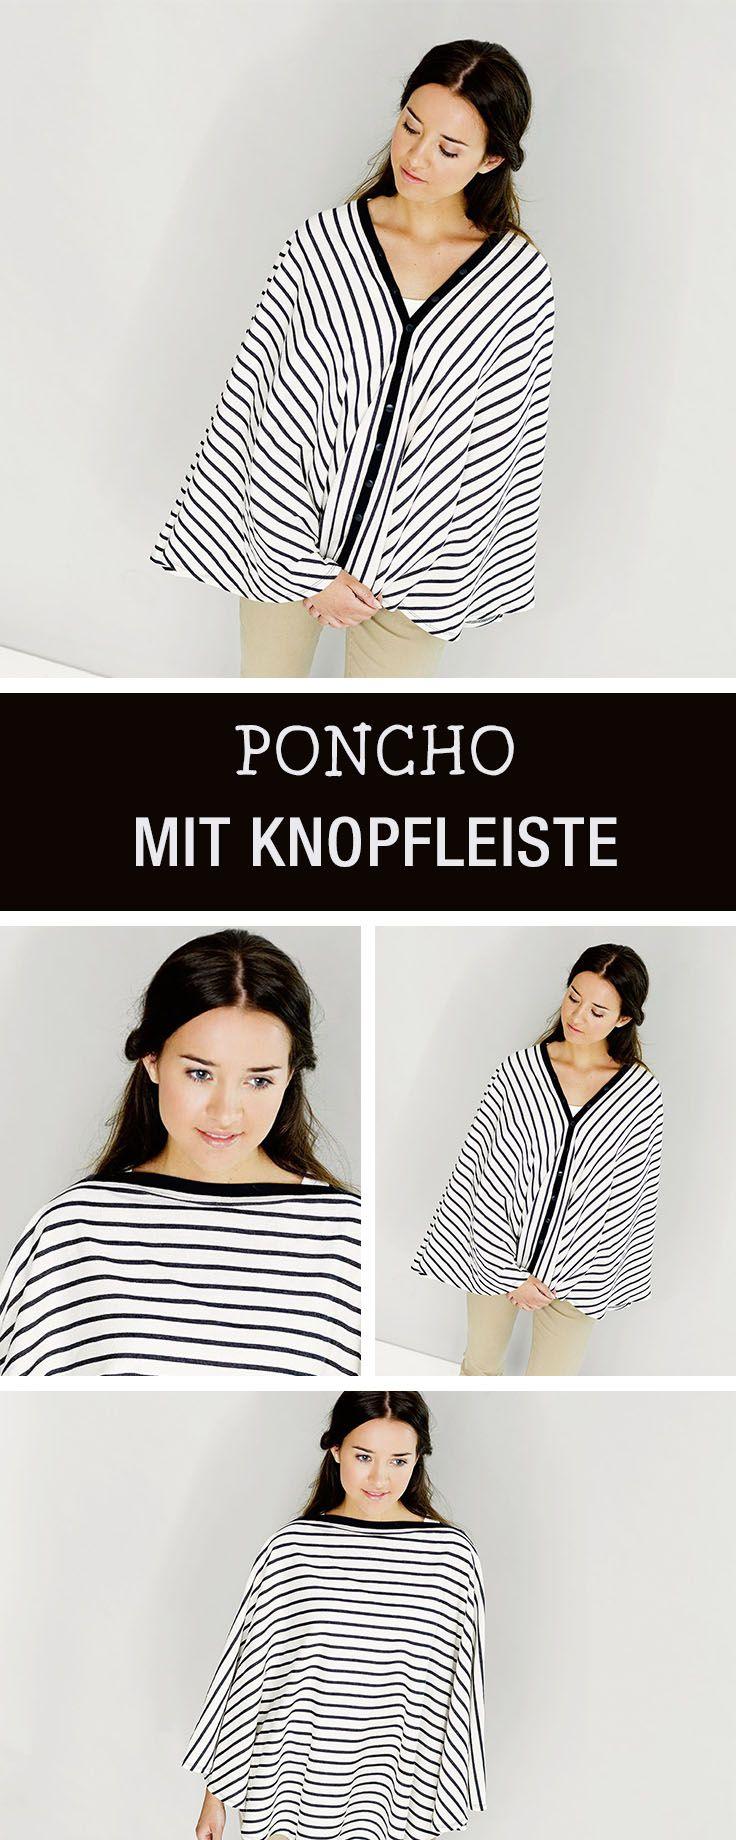 DIY-Anleitung: Poncho mit Knopfleiste nähen via DaWanda.com ...